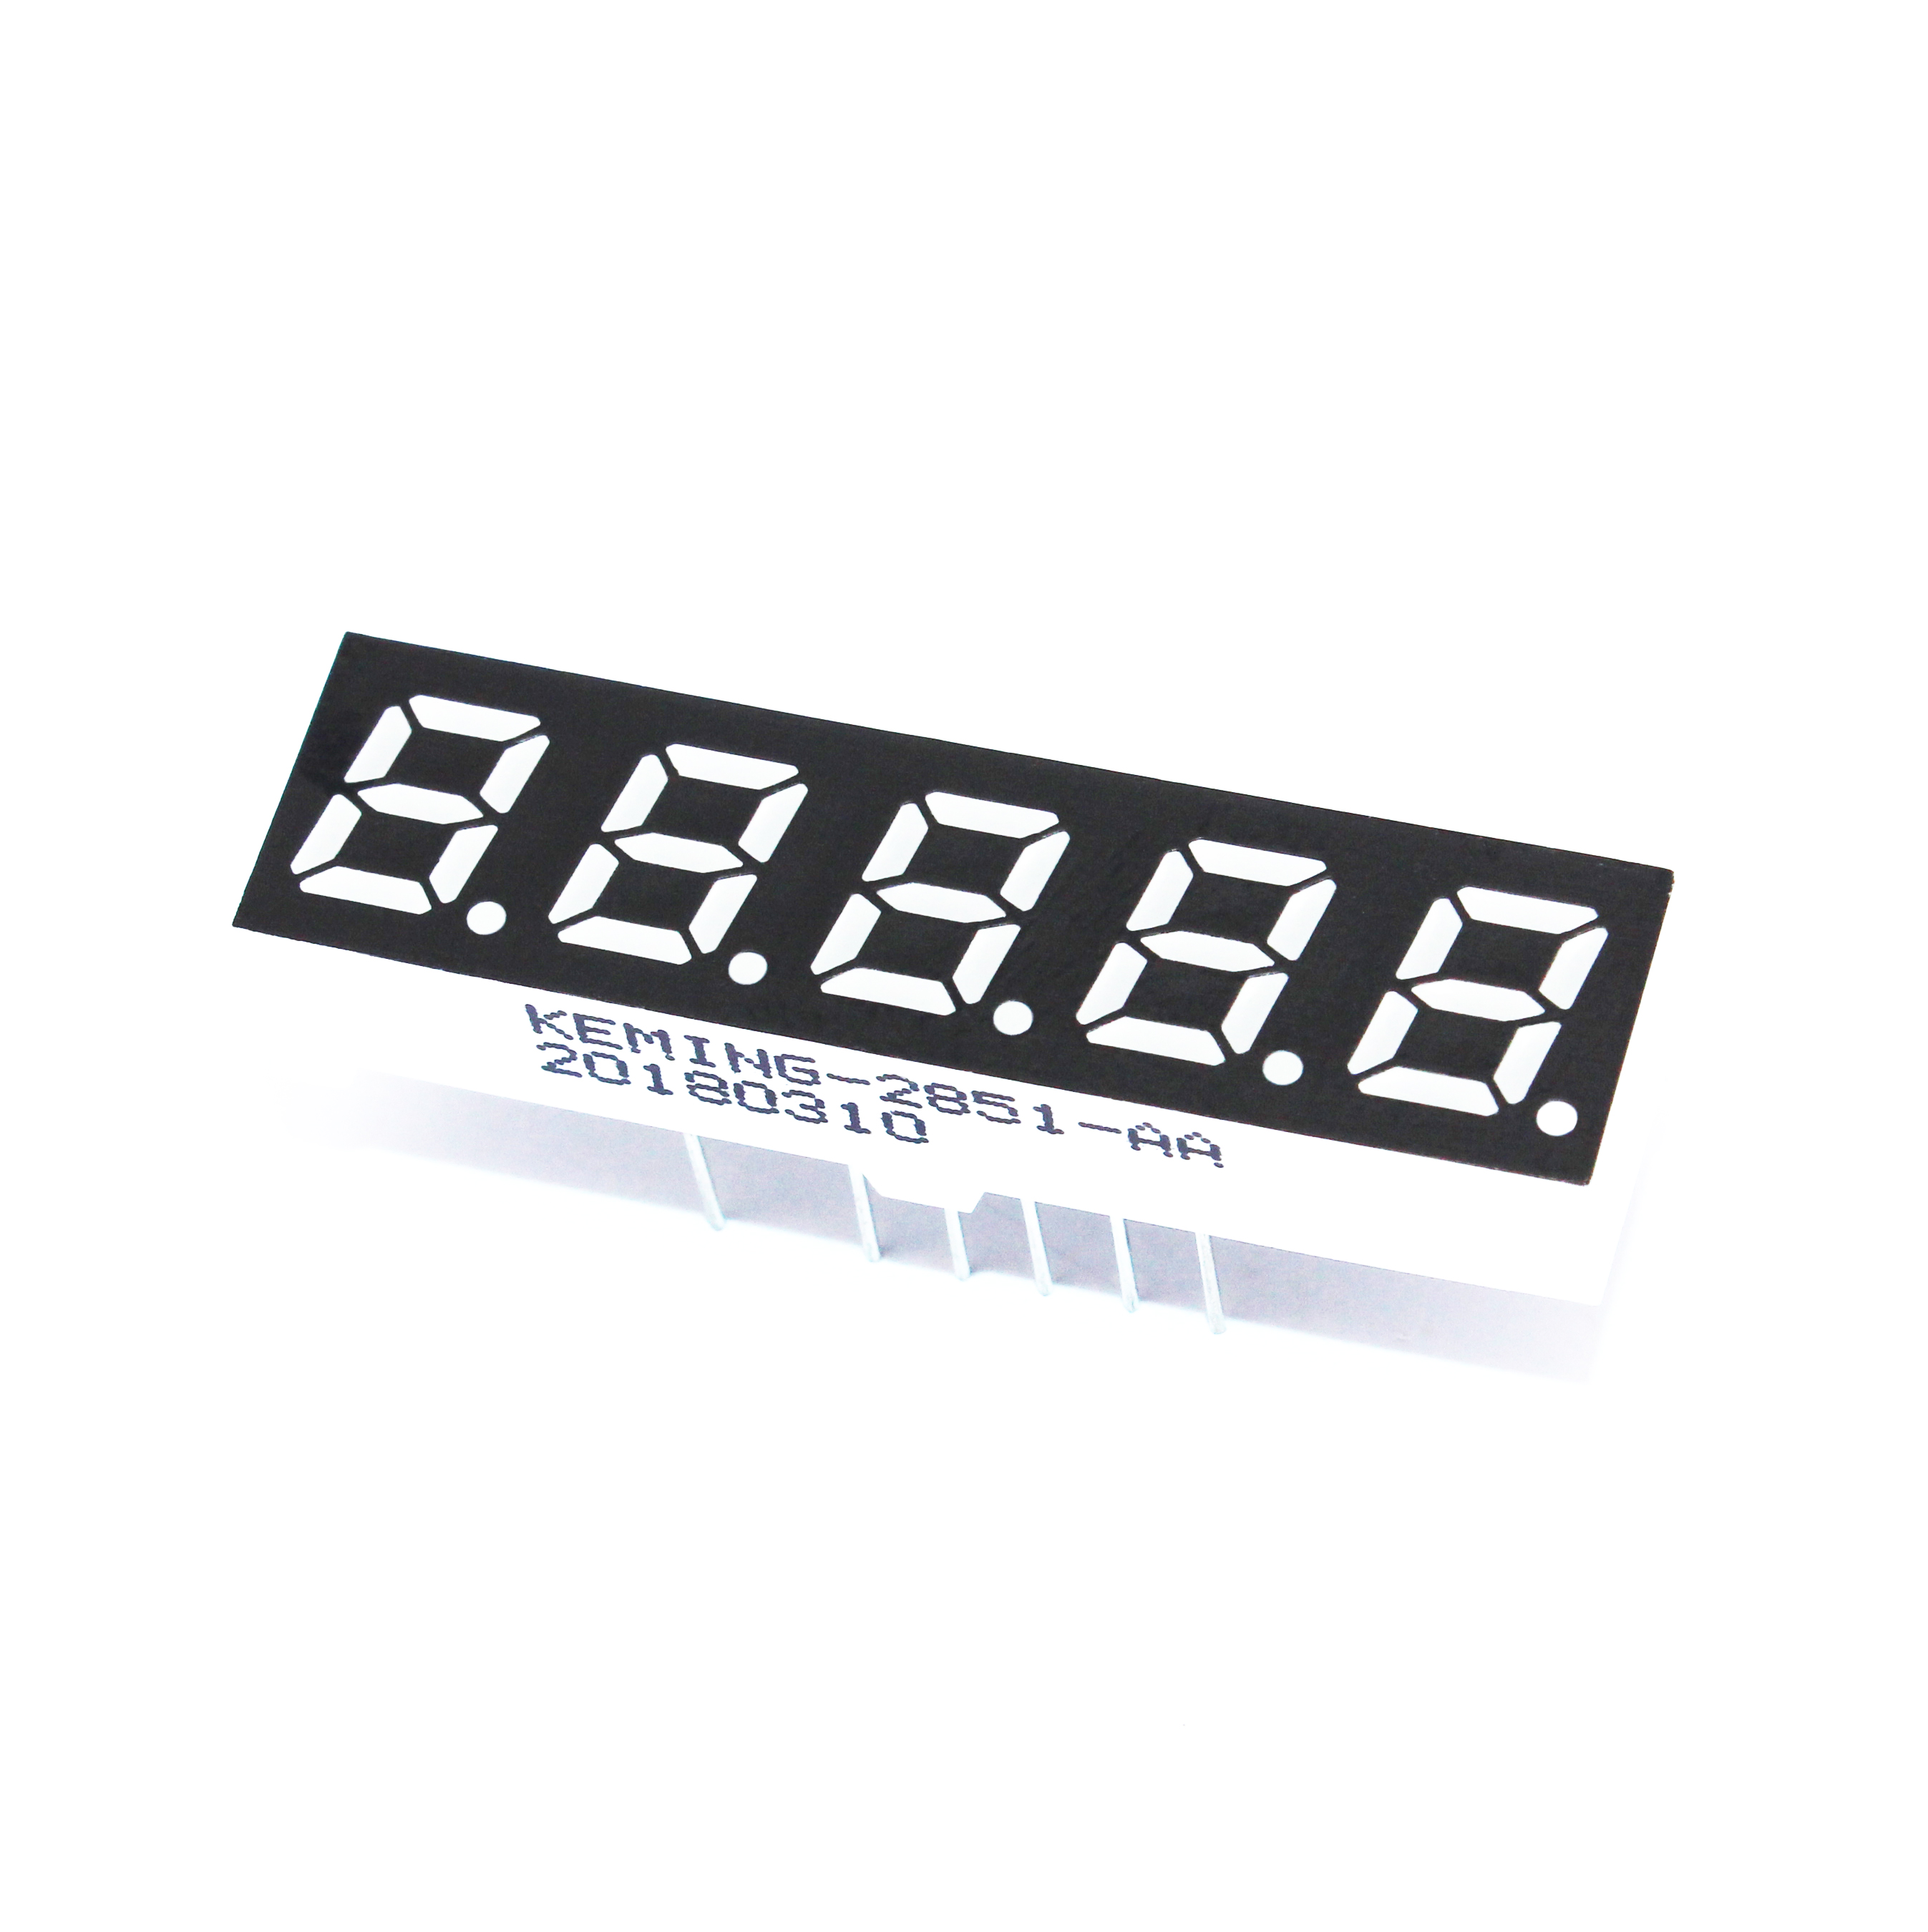 Kaufen China 0,28 Zoll Digital-LED-Anzeige 5-stellige 7-Segment-LED-Anzeigeanode;China 0,28 Zoll Digital-LED-Anzeige 5-stellige 7-Segment-LED-Anzeigeanode Preis;China 0,28 Zoll Digital-LED-Anzeige 5-stellige 7-Segment-LED-Anzeigeanode Marken;China 0,28 Zoll Digital-LED-Anzeige 5-stellige 7-Segment-LED-Anzeigeanode Hersteller;China 0,28 Zoll Digital-LED-Anzeige 5-stellige 7-Segment-LED-Anzeigeanode Zitat;China 0,28 Zoll Digital-LED-Anzeige 5-stellige 7-Segment-LED-Anzeigeanode Unternehmen